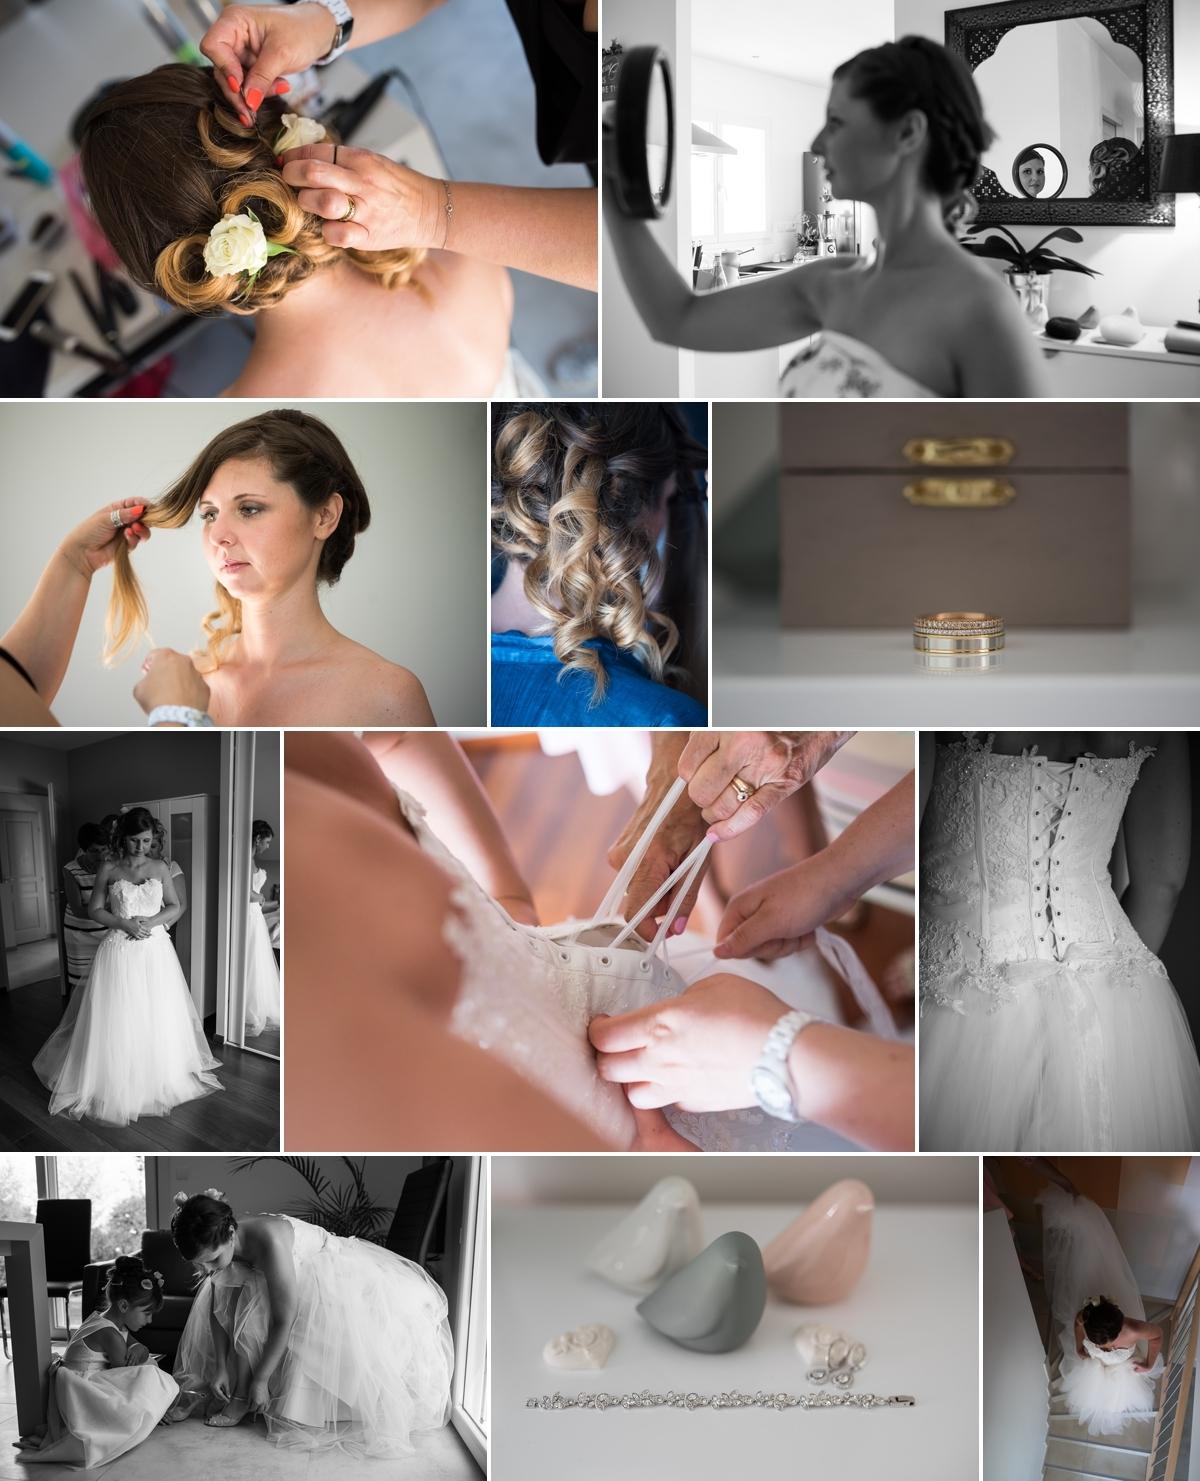 Preparatif-mariage-beaune-claudine-nicolas